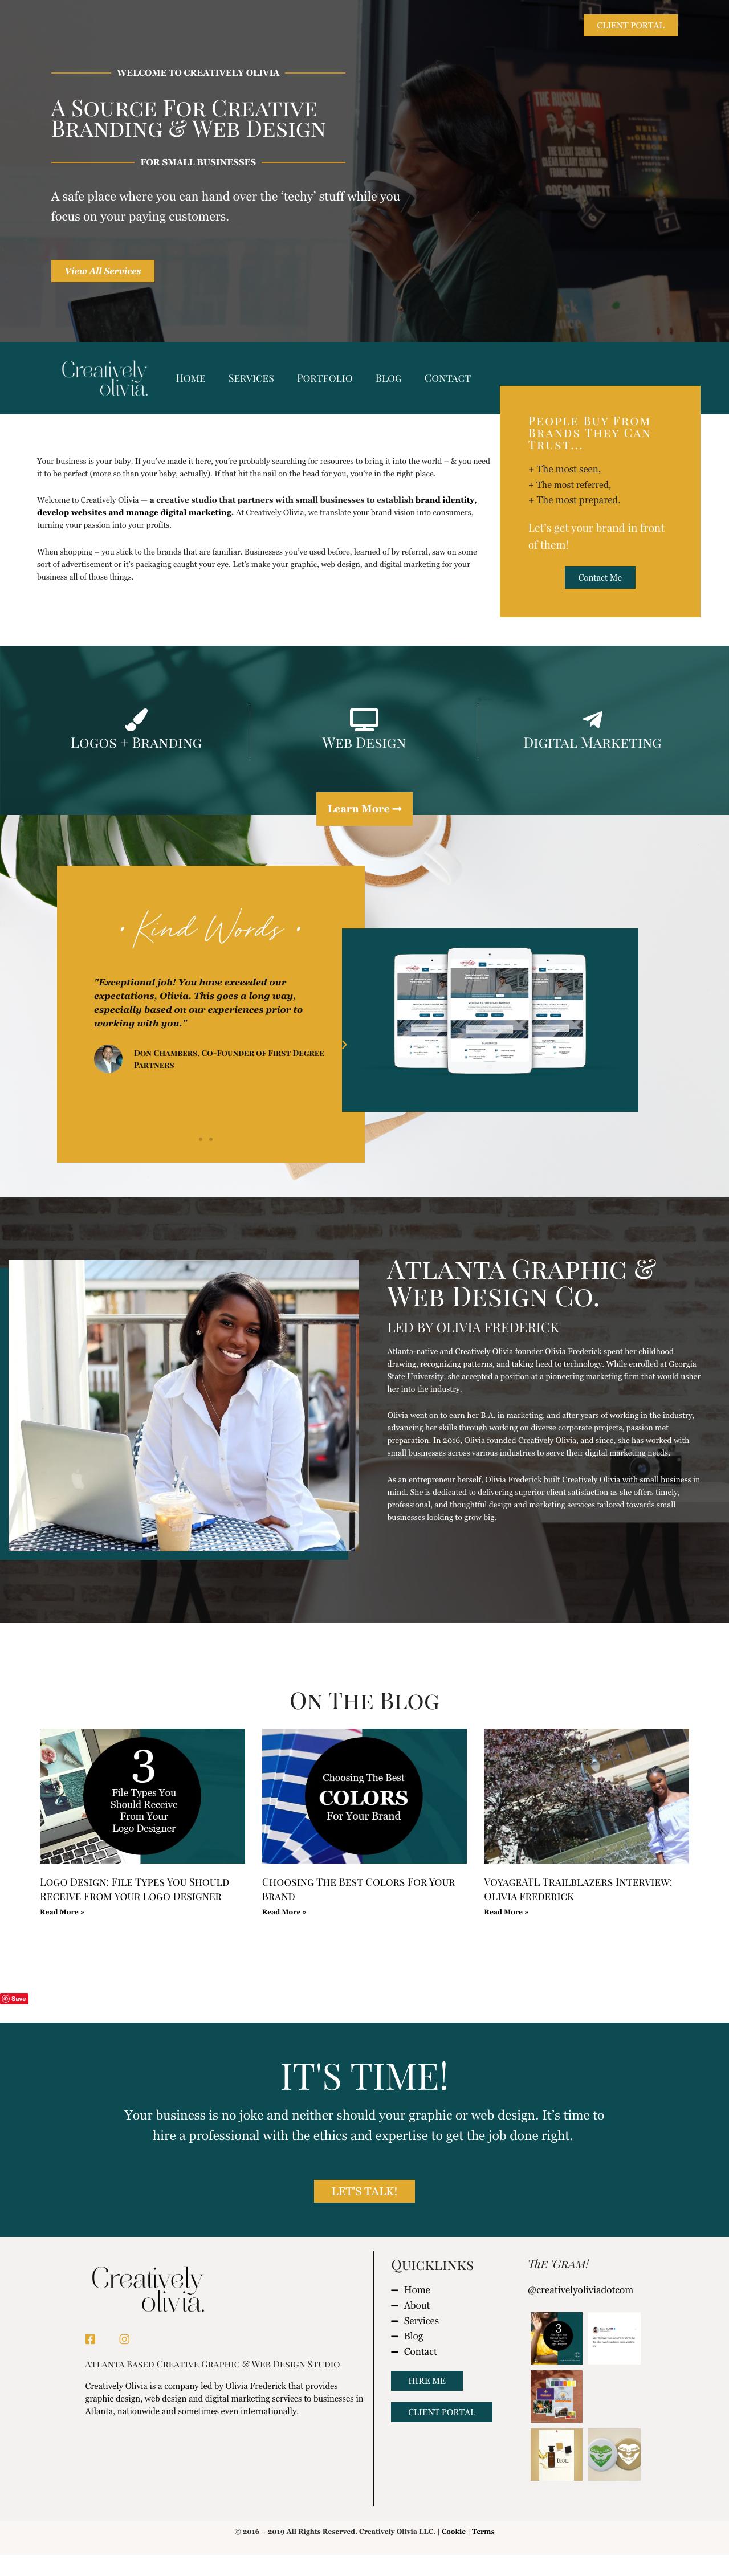 Website Design For Graphic And Web Designer In Atlanta Ga Combines Bold Colors With A Custom Theme Style Unique T Web Design Website Design Web Design Studio